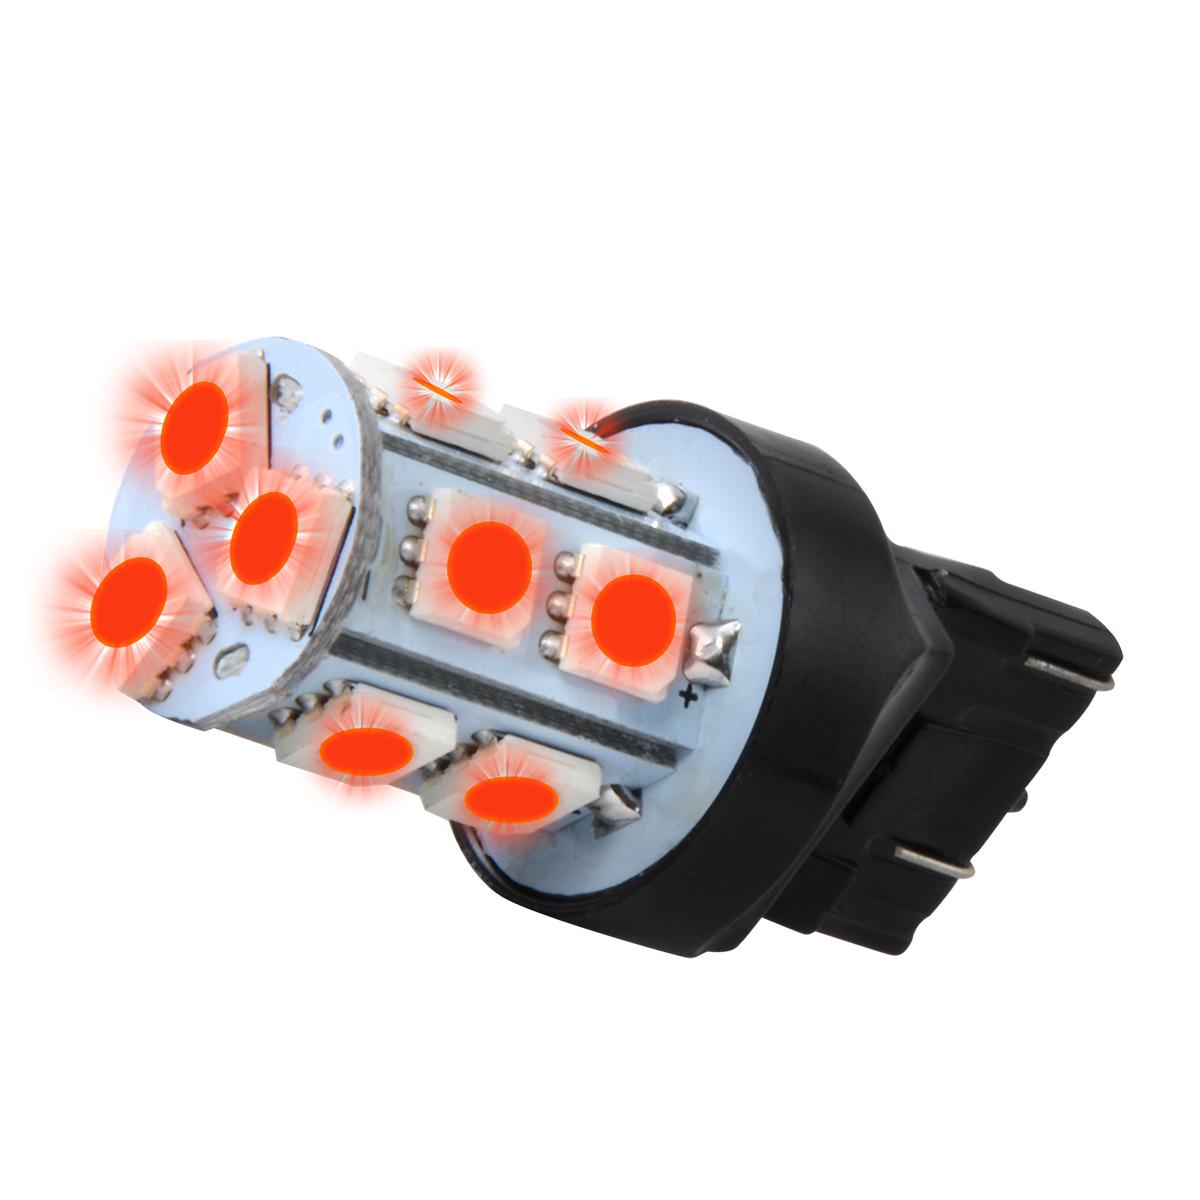 70584 #7443 Tower Style 13 LED Light Bulb